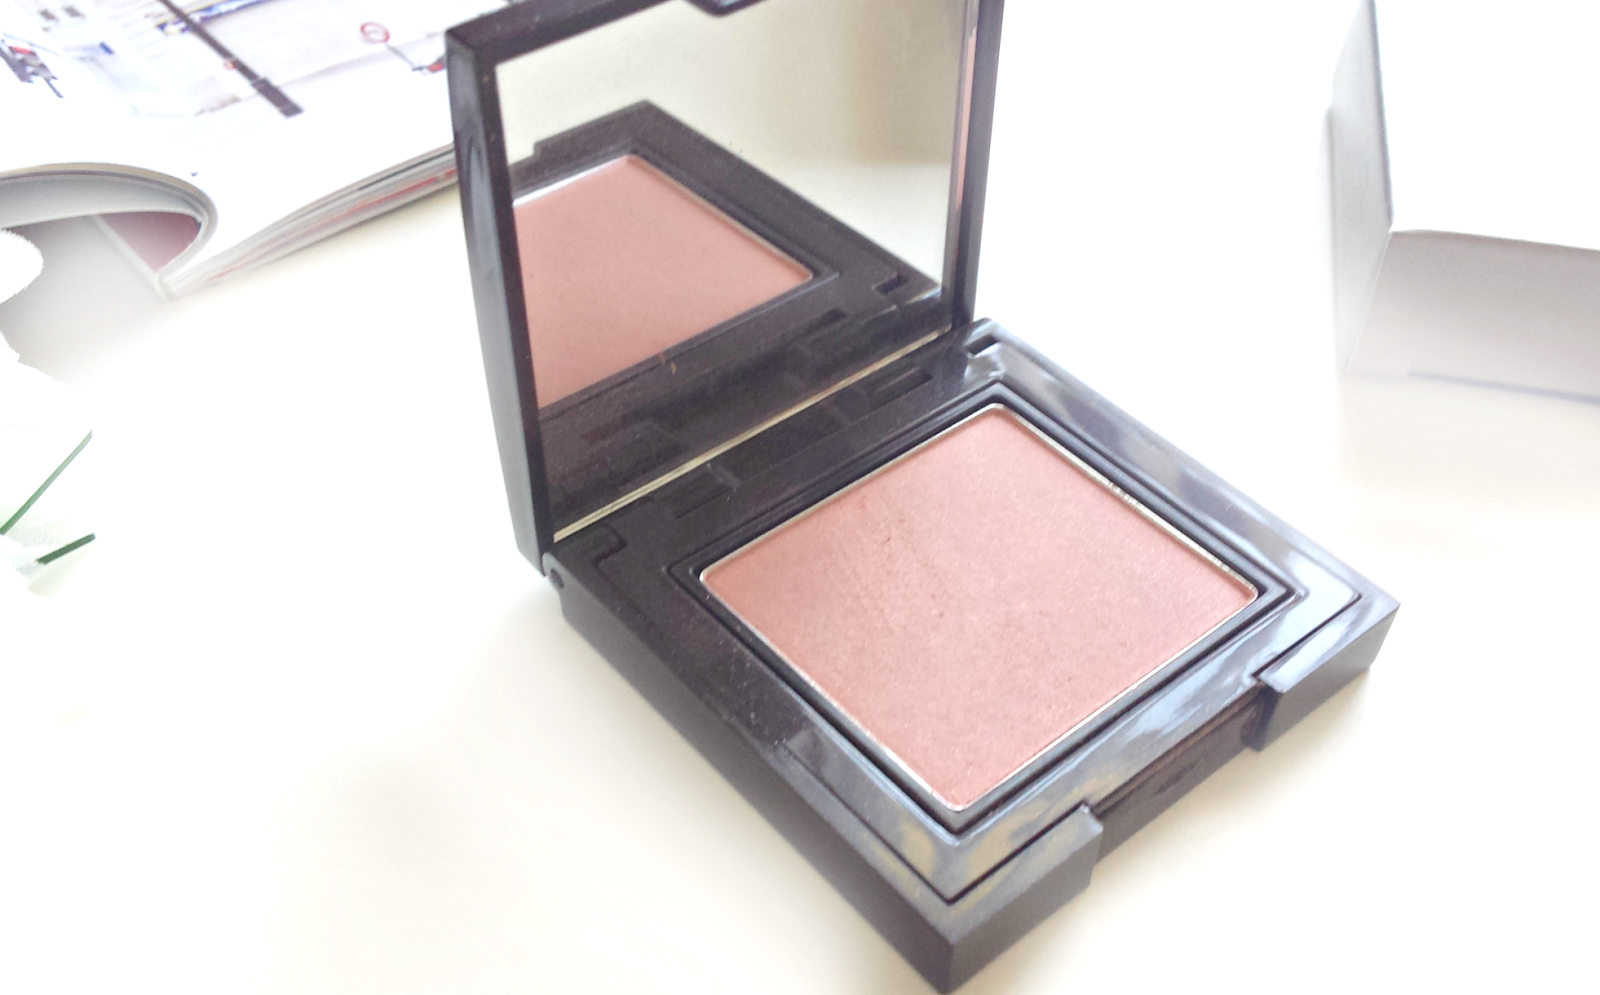 Laura Mercier Second Skin Cheek Colour Review